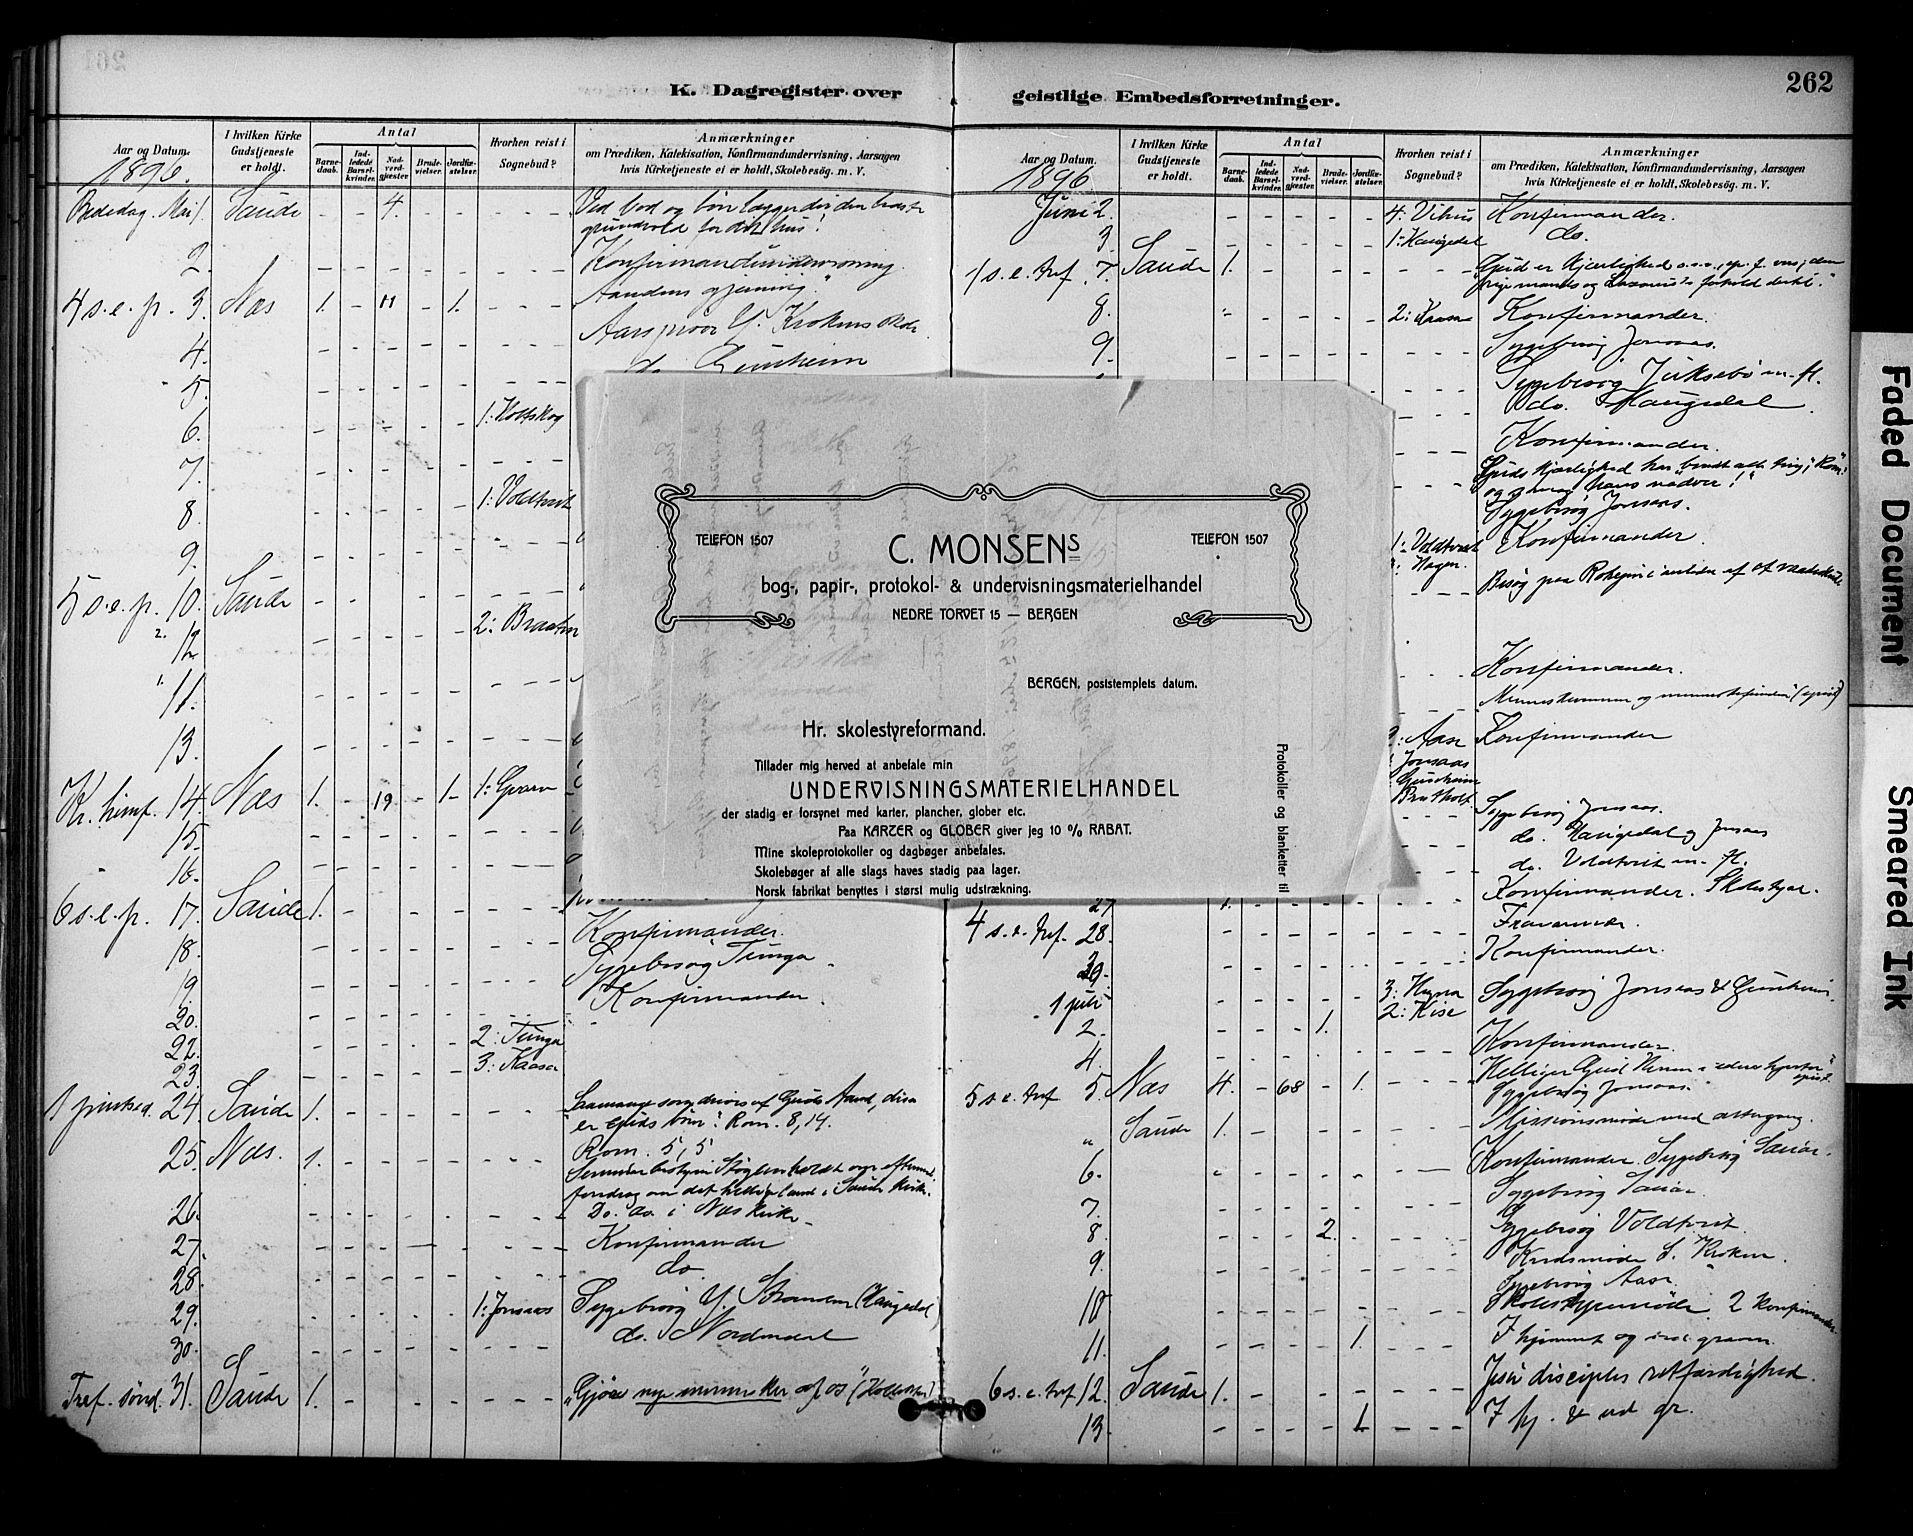 SAKO, Sauherad kirkebøker, F/Fa/L0009: Ministerialbok nr. I 9, 1887-1912, s. 262